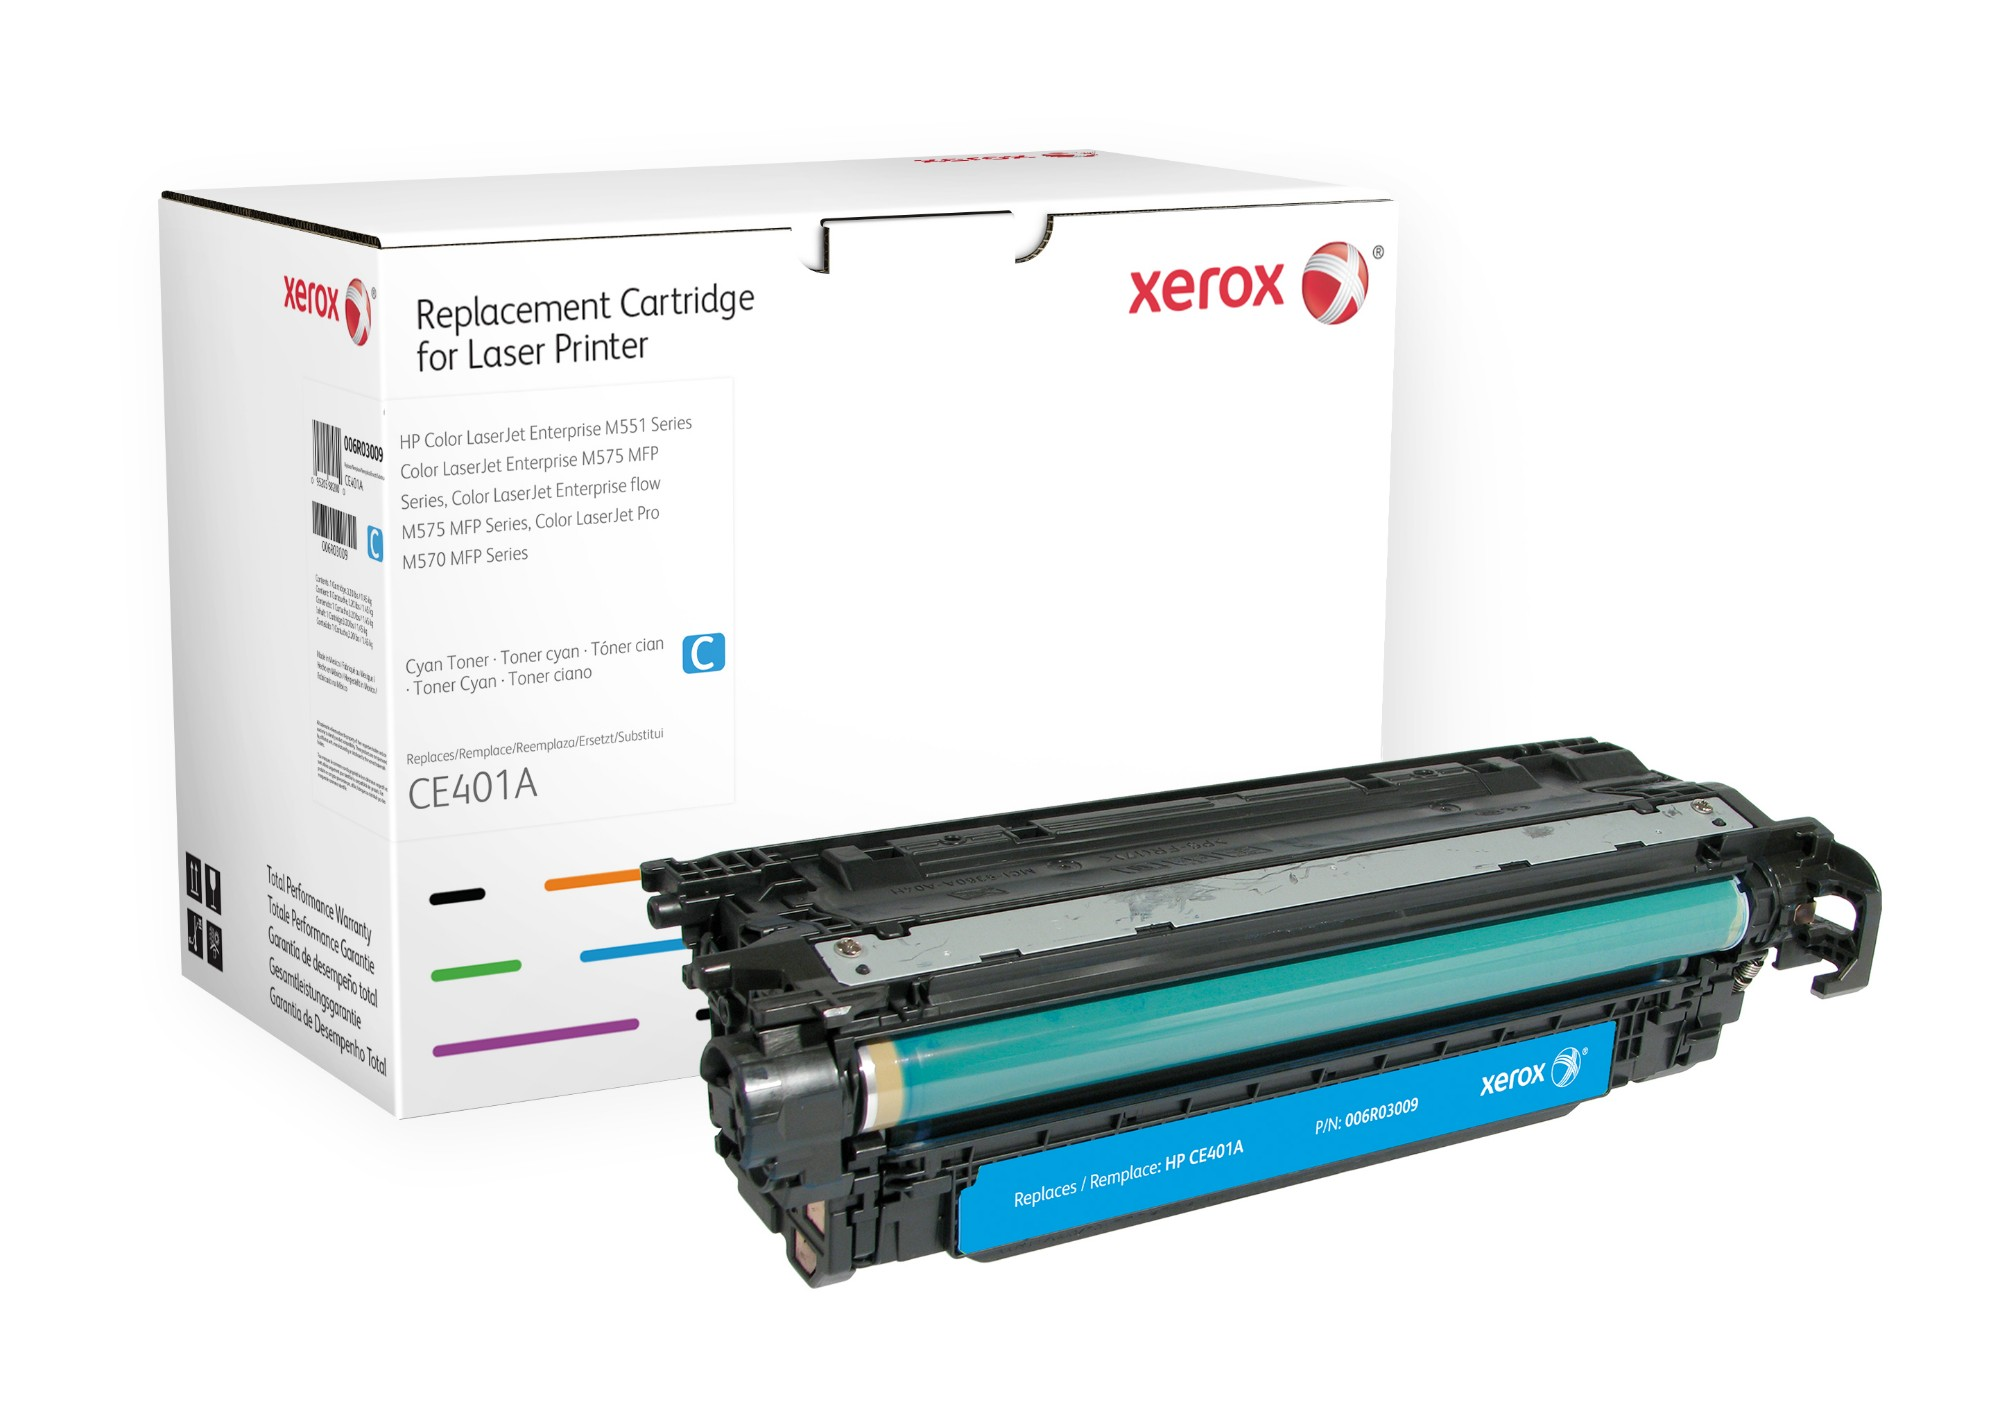 Xerox Cartucho de tóner cian. Equivalente a HP CE401A. Compatible con HP Colour LaserJet M551DN, Colour LaserJet M551